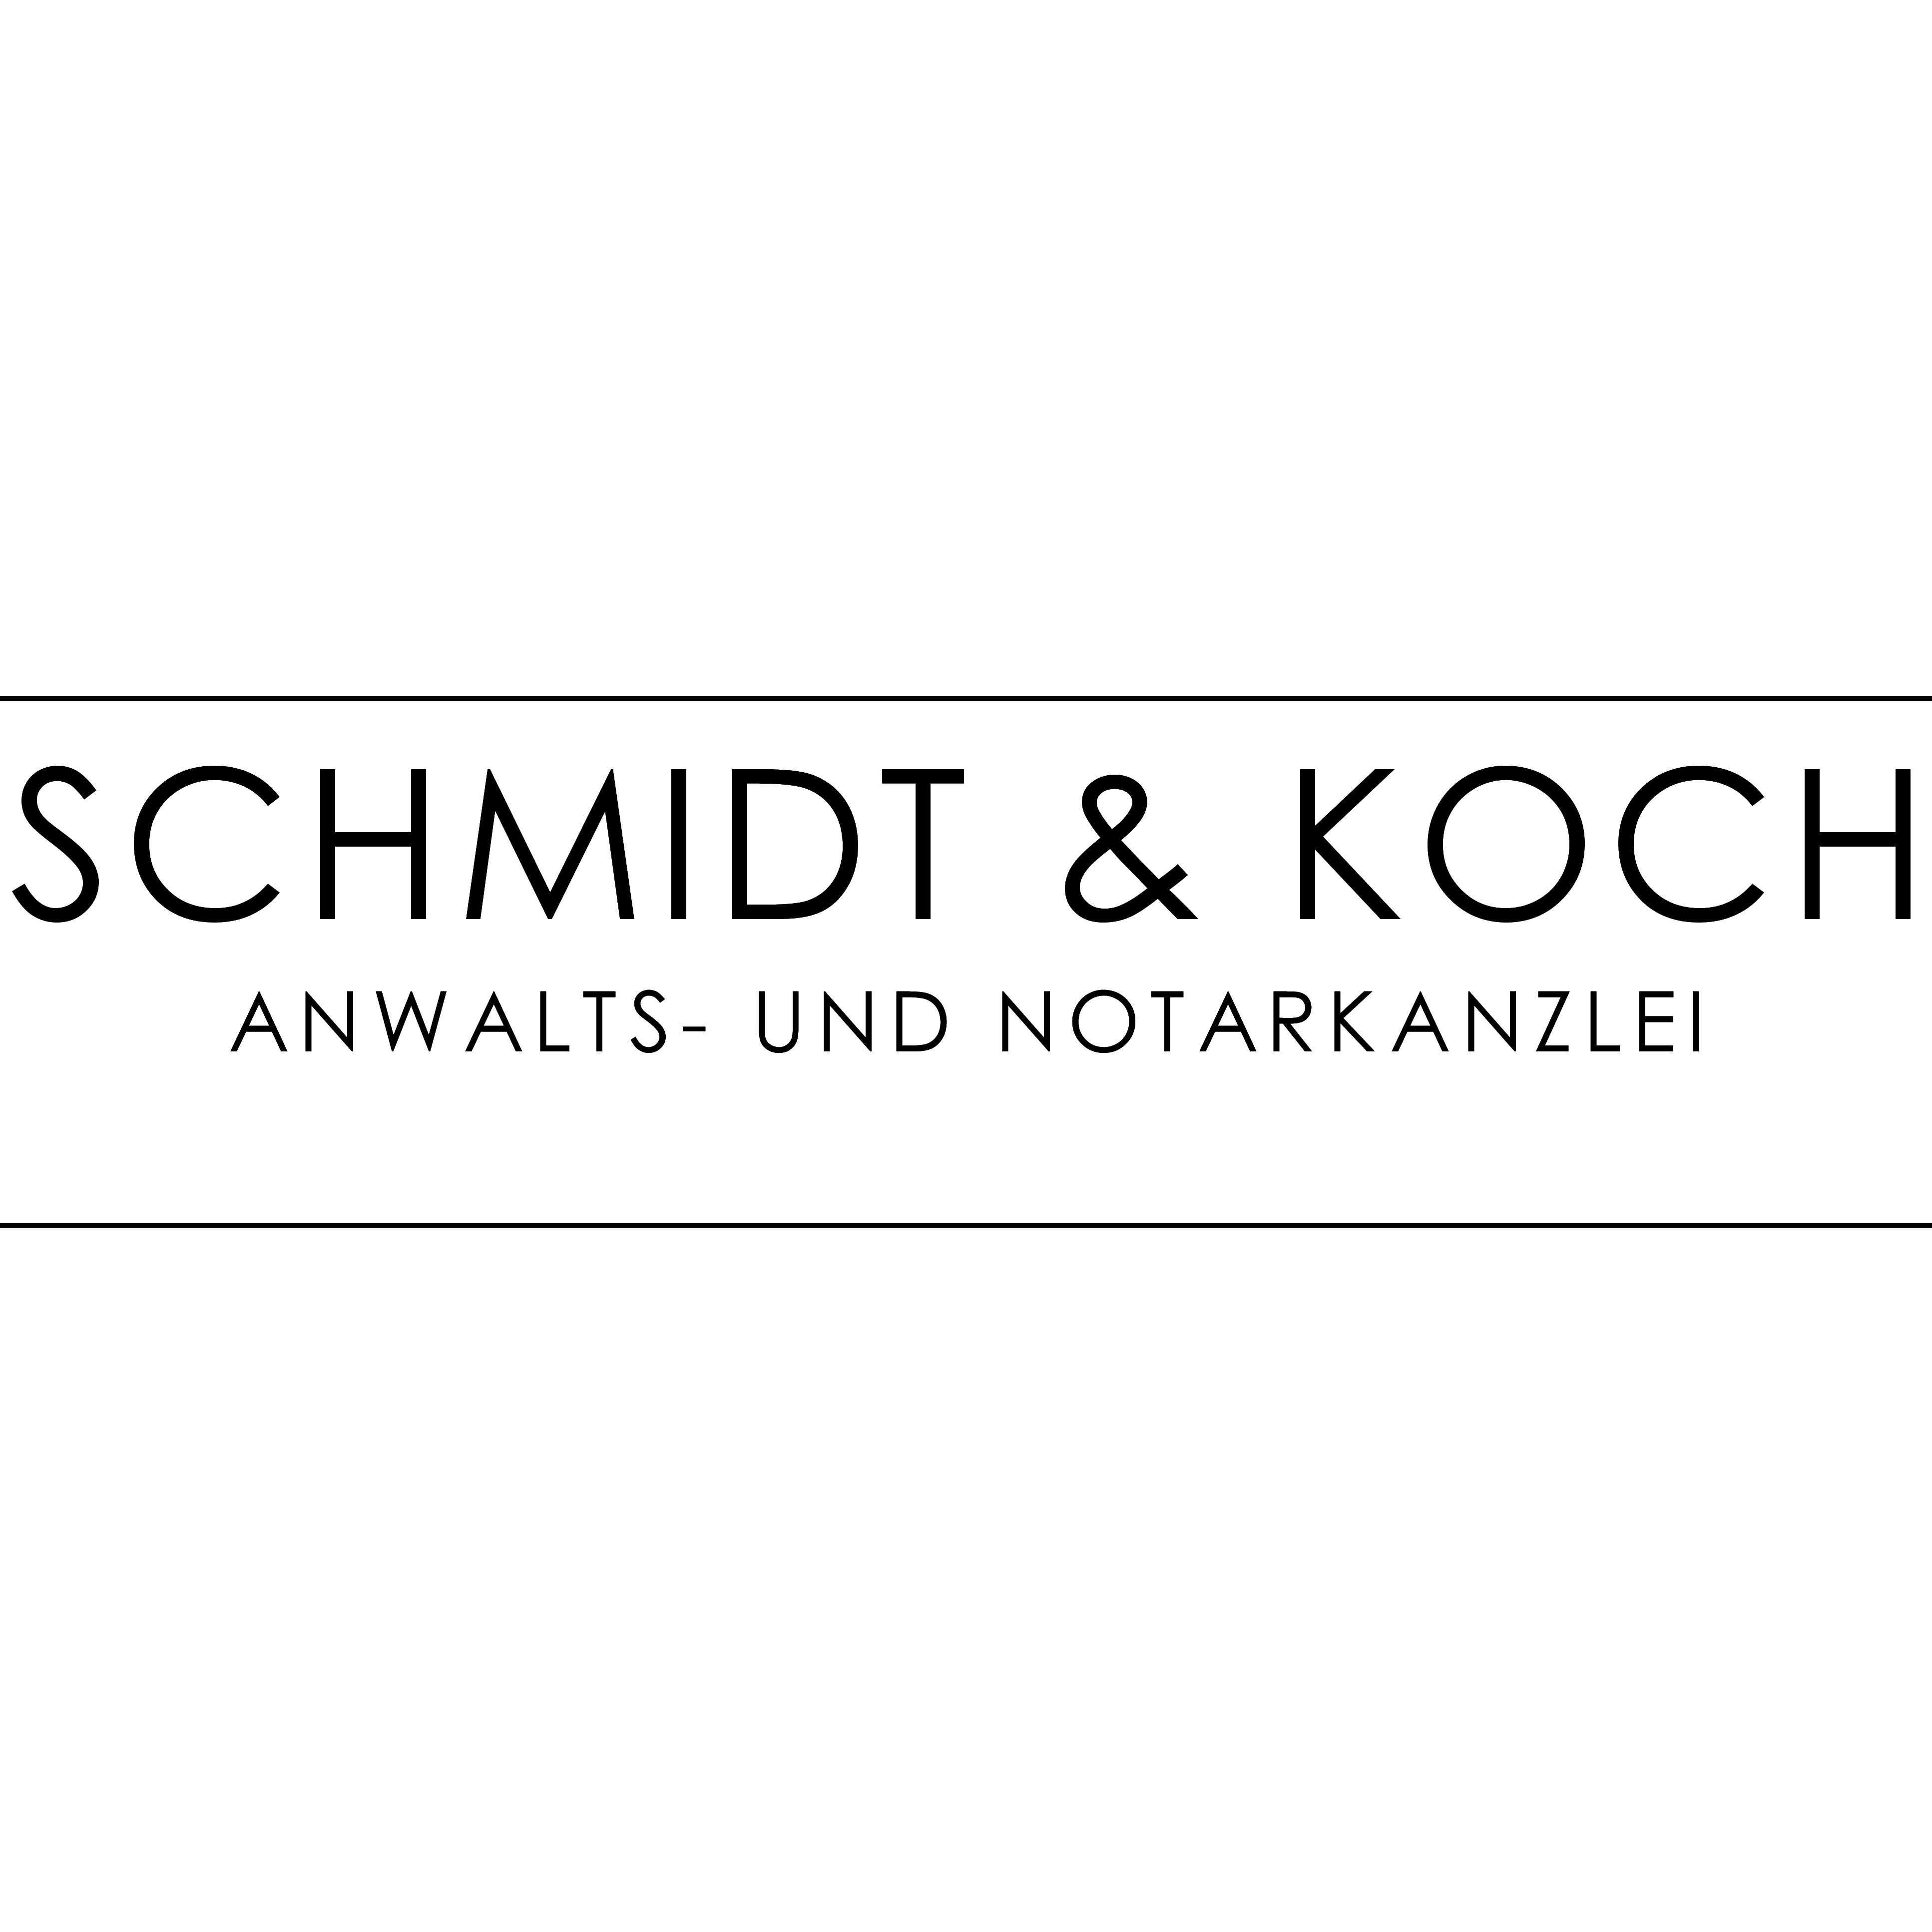 Anwalts- und Notarkanzlei Schmidt & Koch